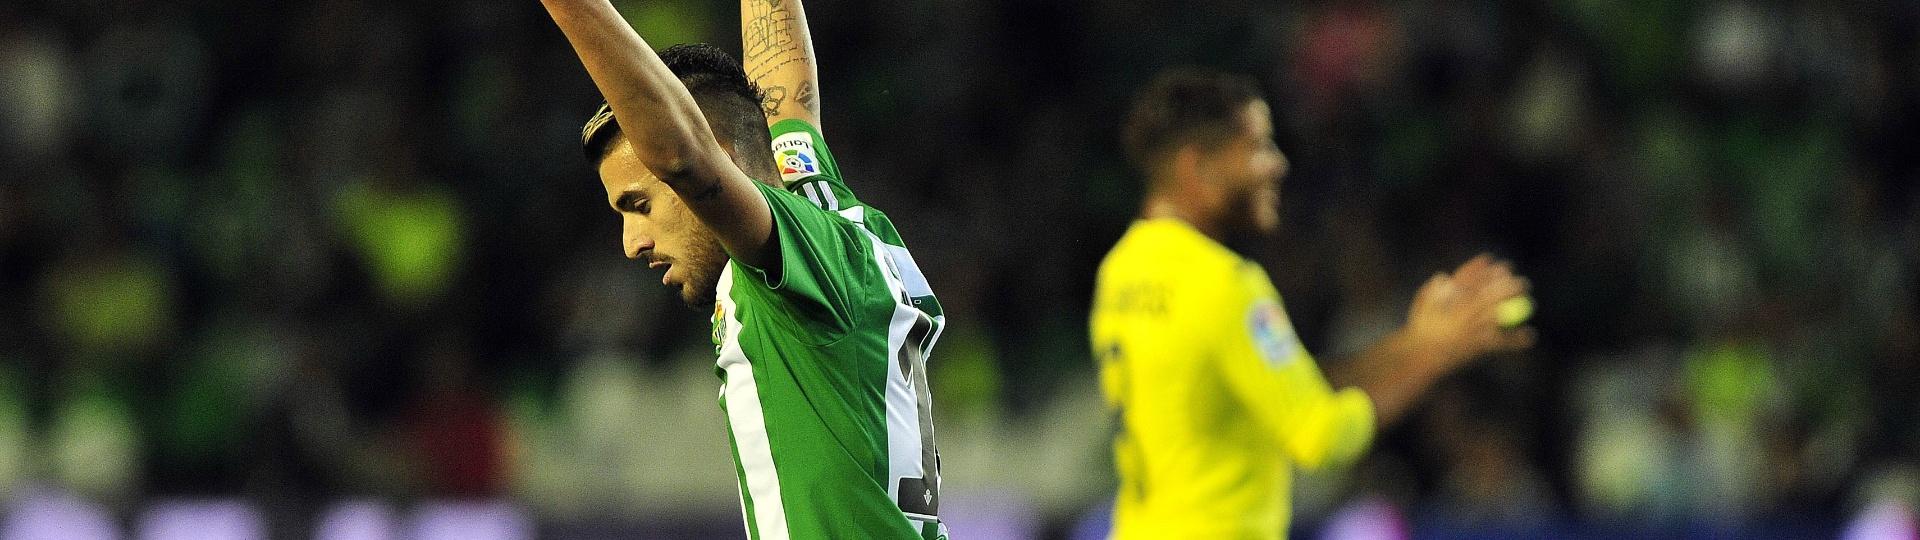 Dani Ceballos, do Betis, está na mira do Real Madrid